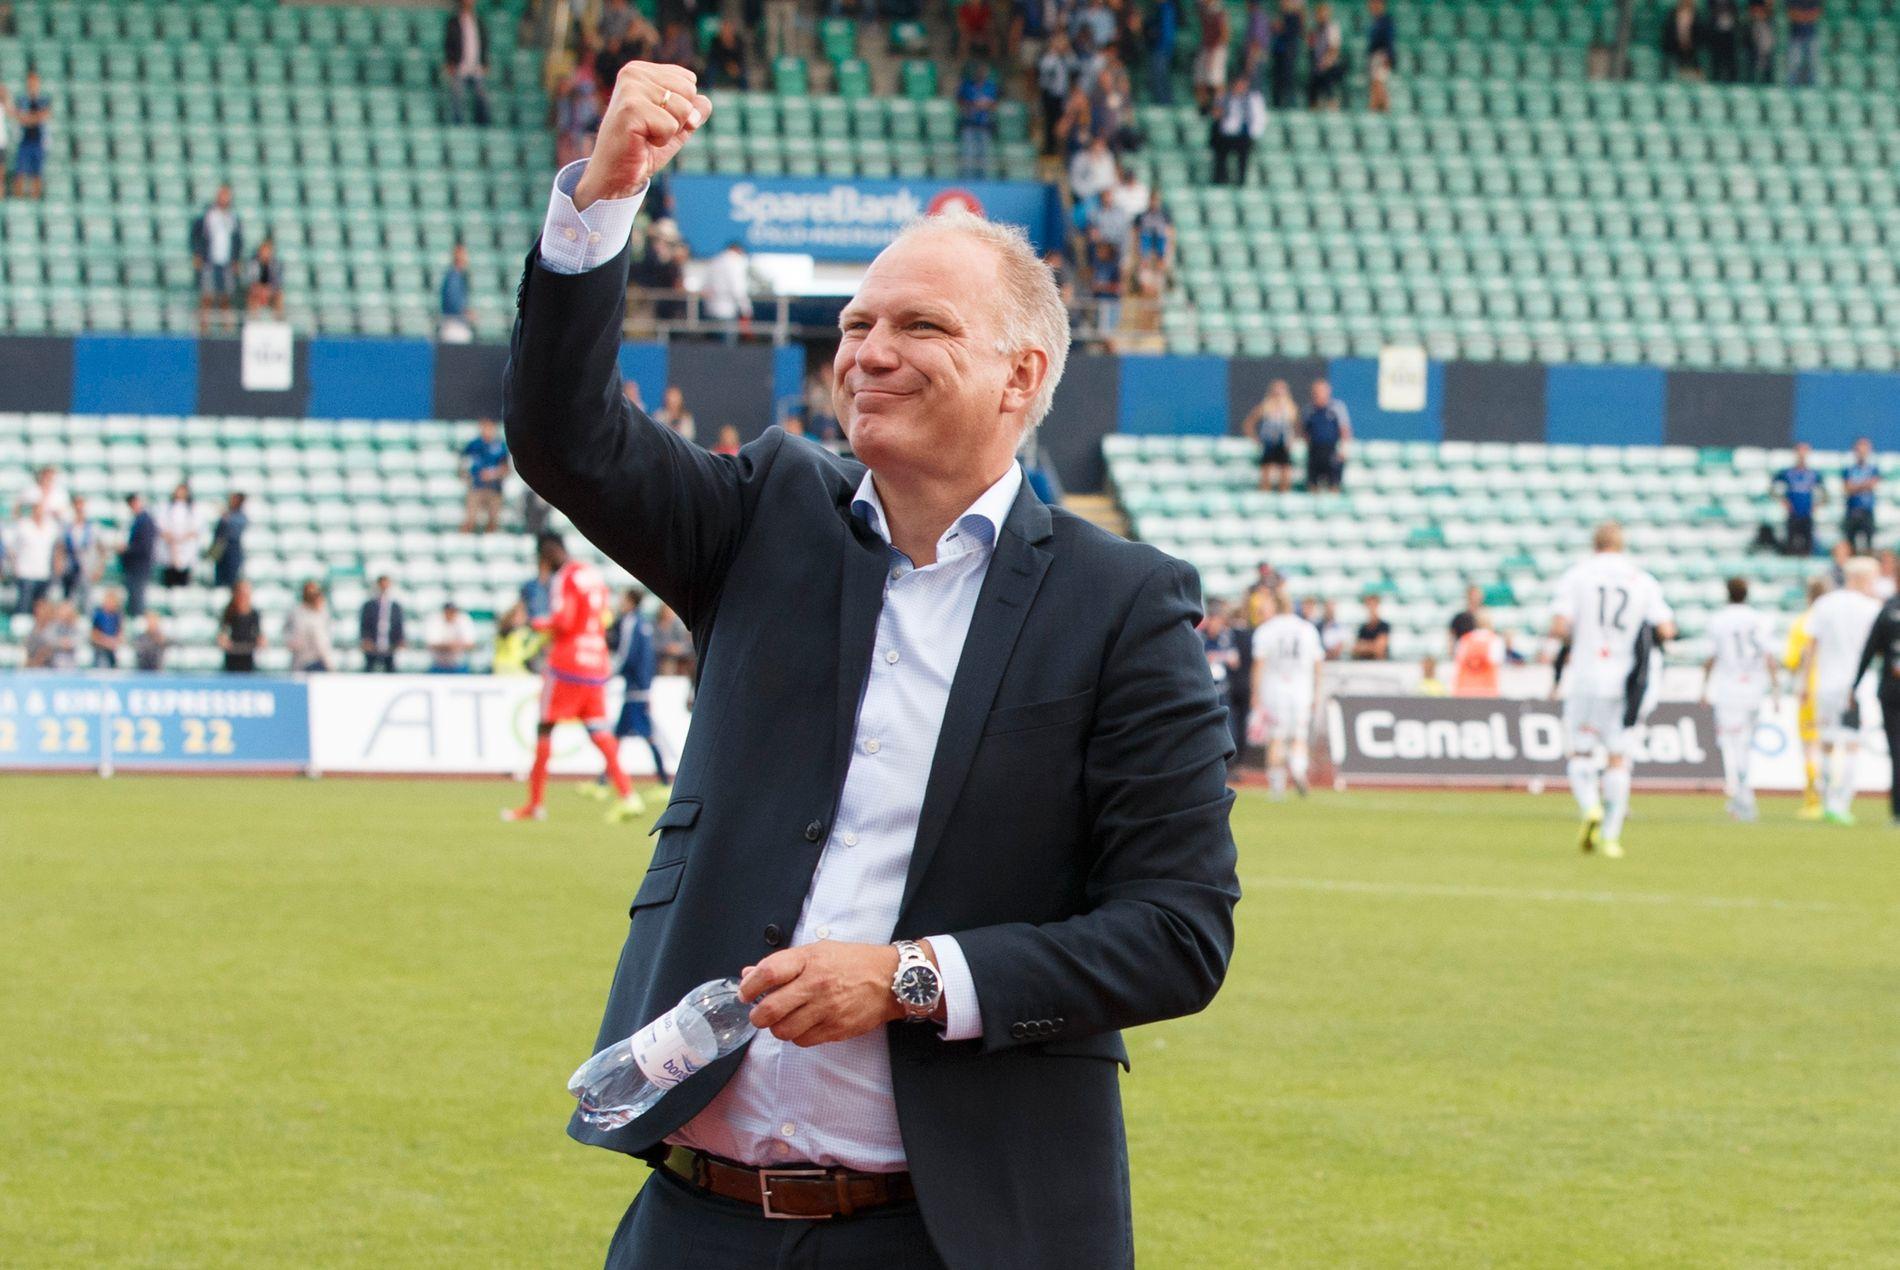 Odd-trener Dag-Eilev Fagermo er positiv til Ole Gunnar Solskjær som ny landslagssjef.